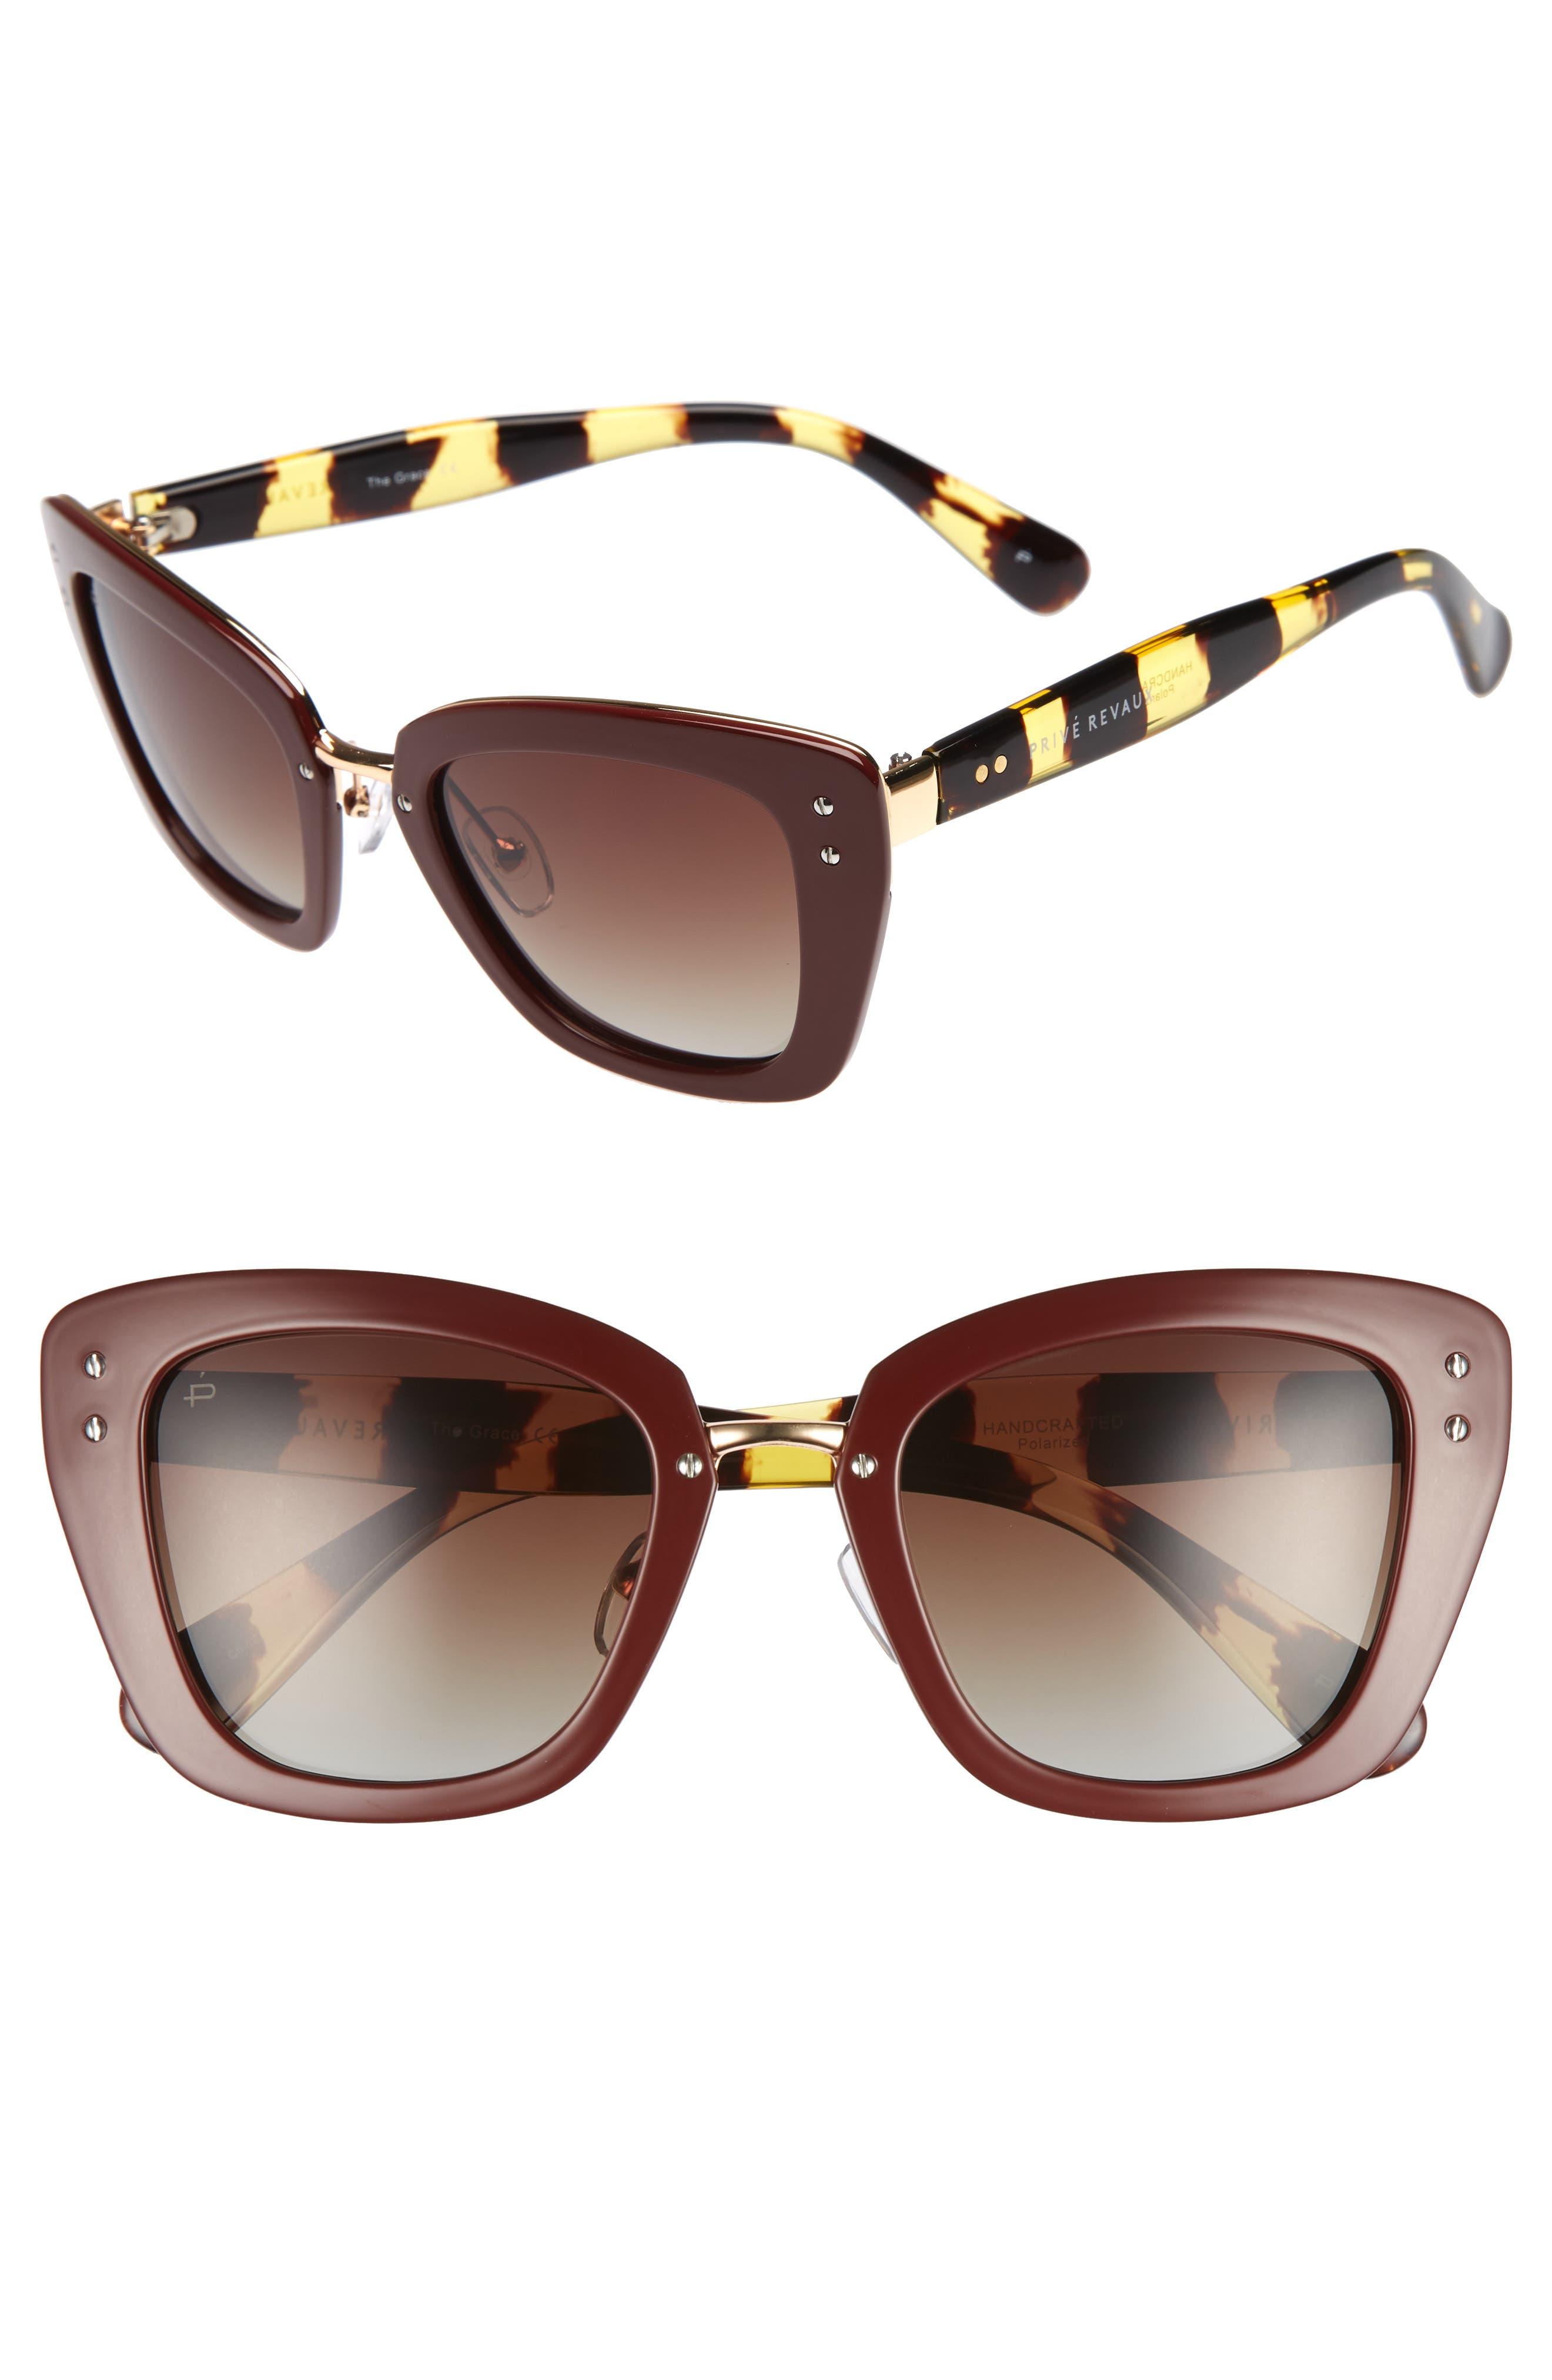 Privé Revaux The Grace 52mm Cat Eye Sunglasses,                             Main thumbnail 1, color,                             Red